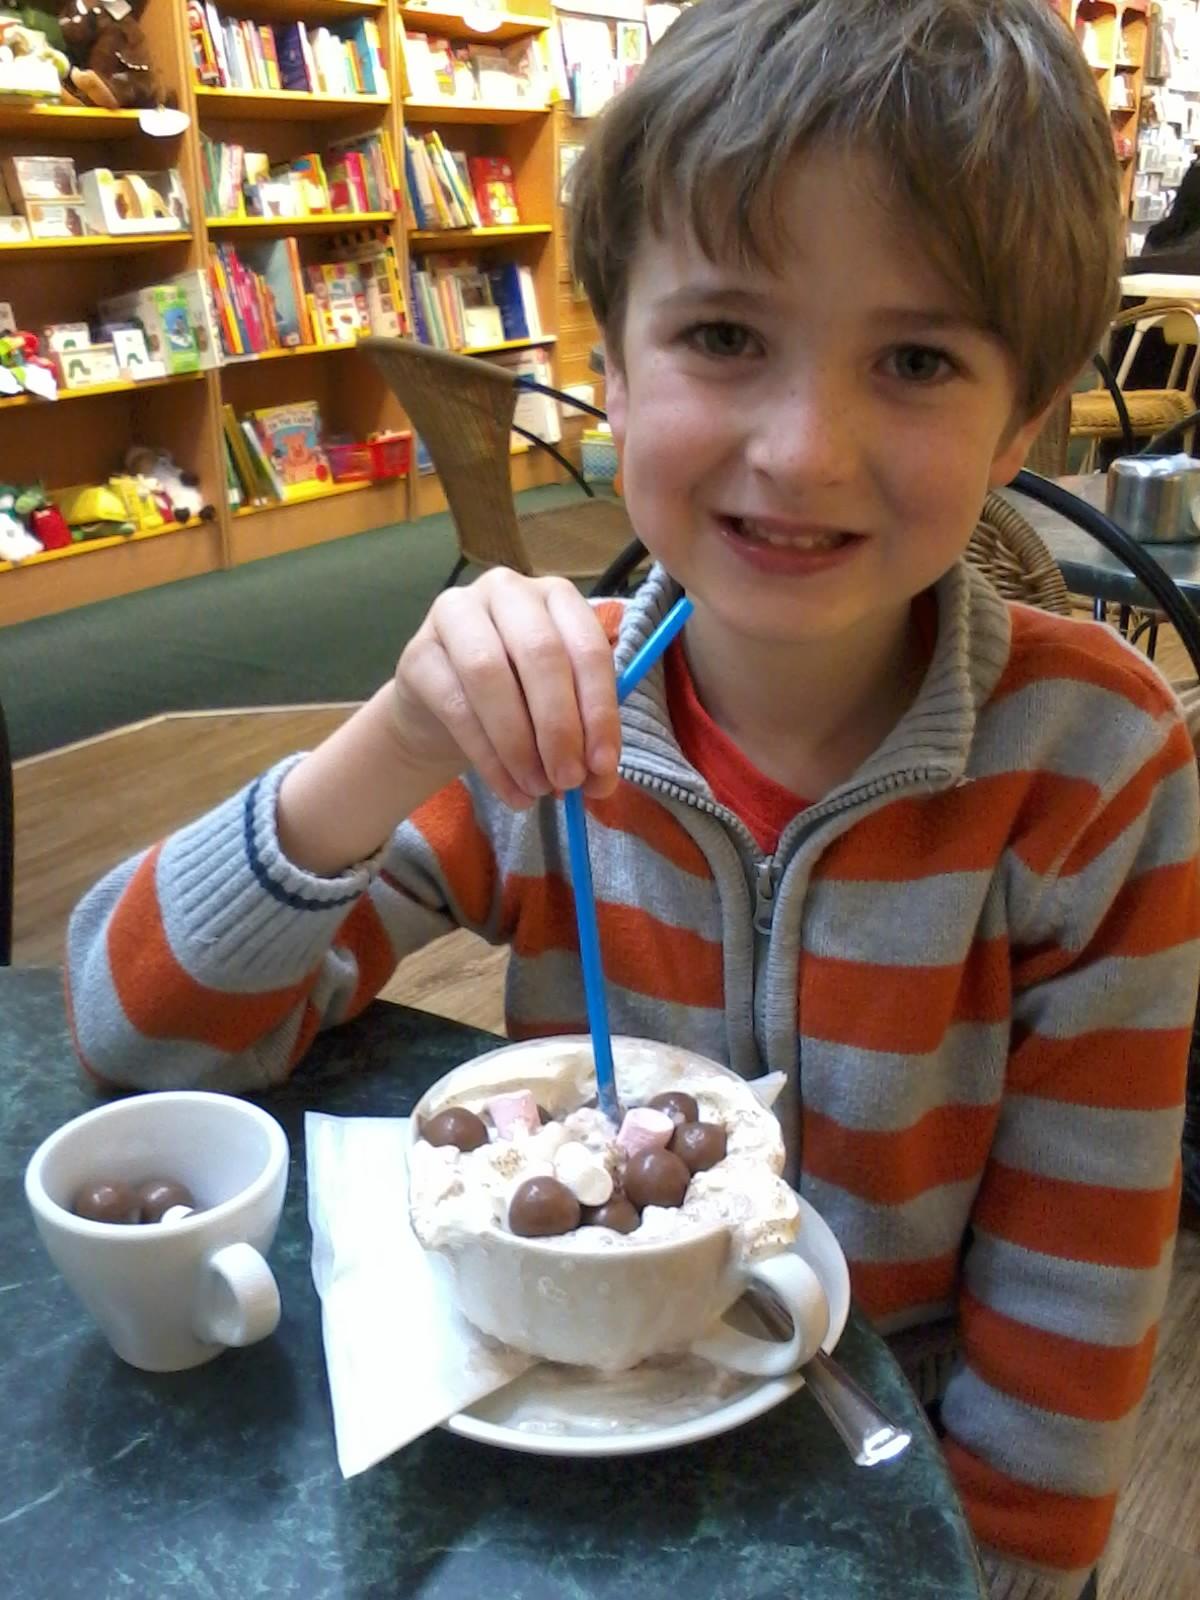 I could see Kieran thoroughly enjoying exploring London!